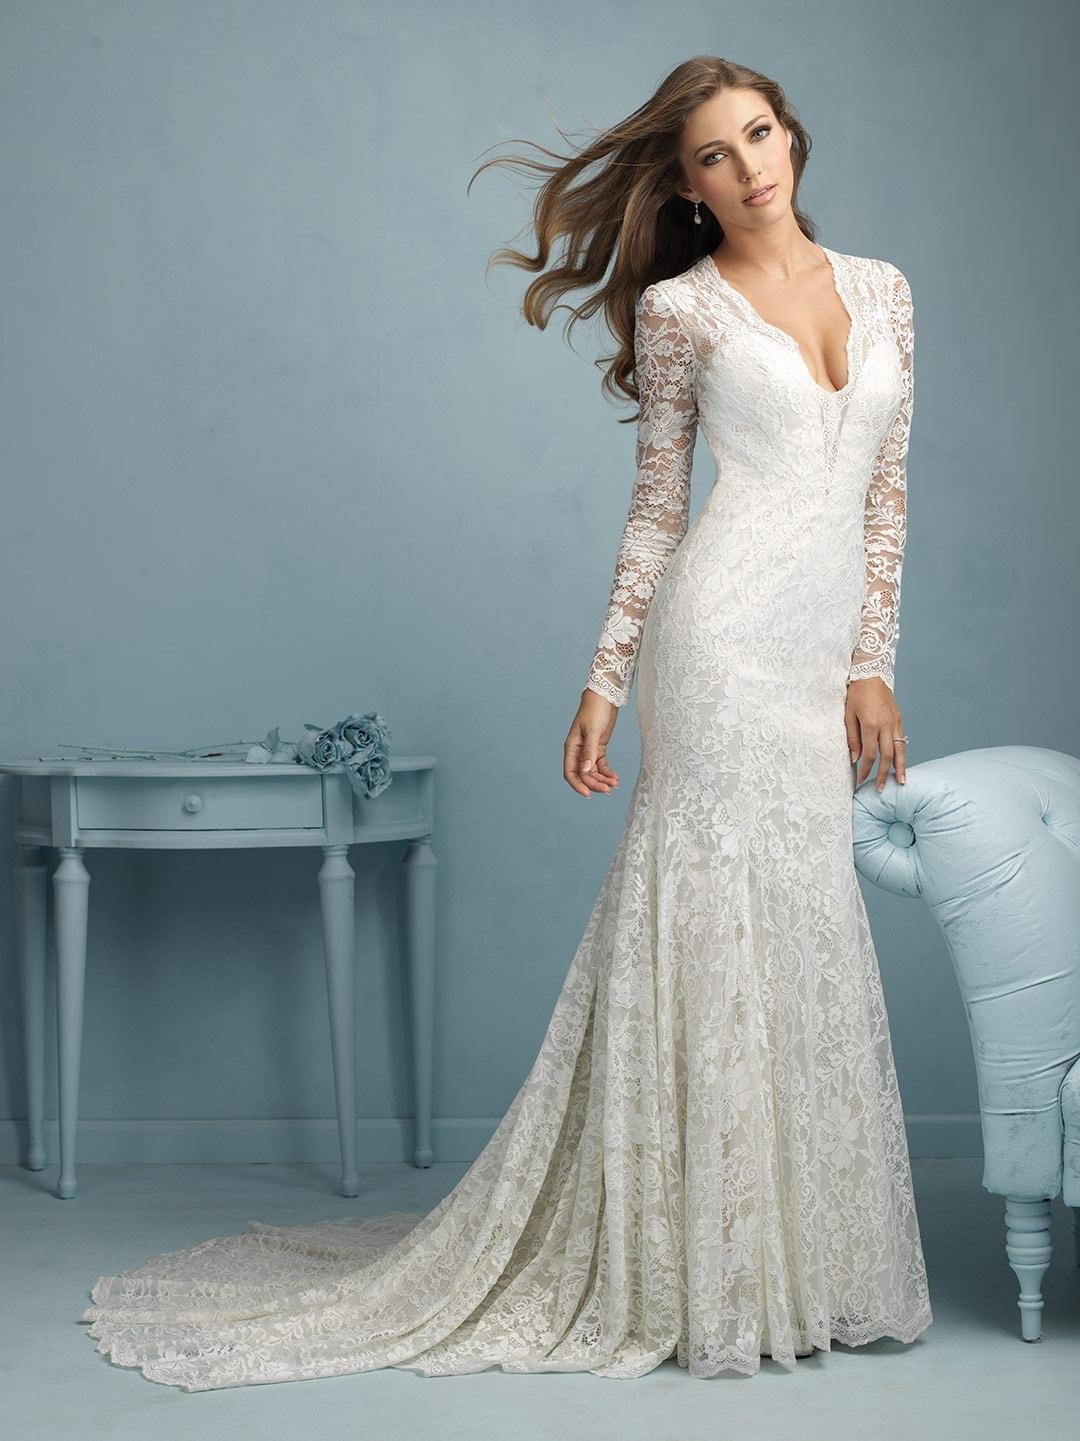 embrace bridal geelong 9213ft1